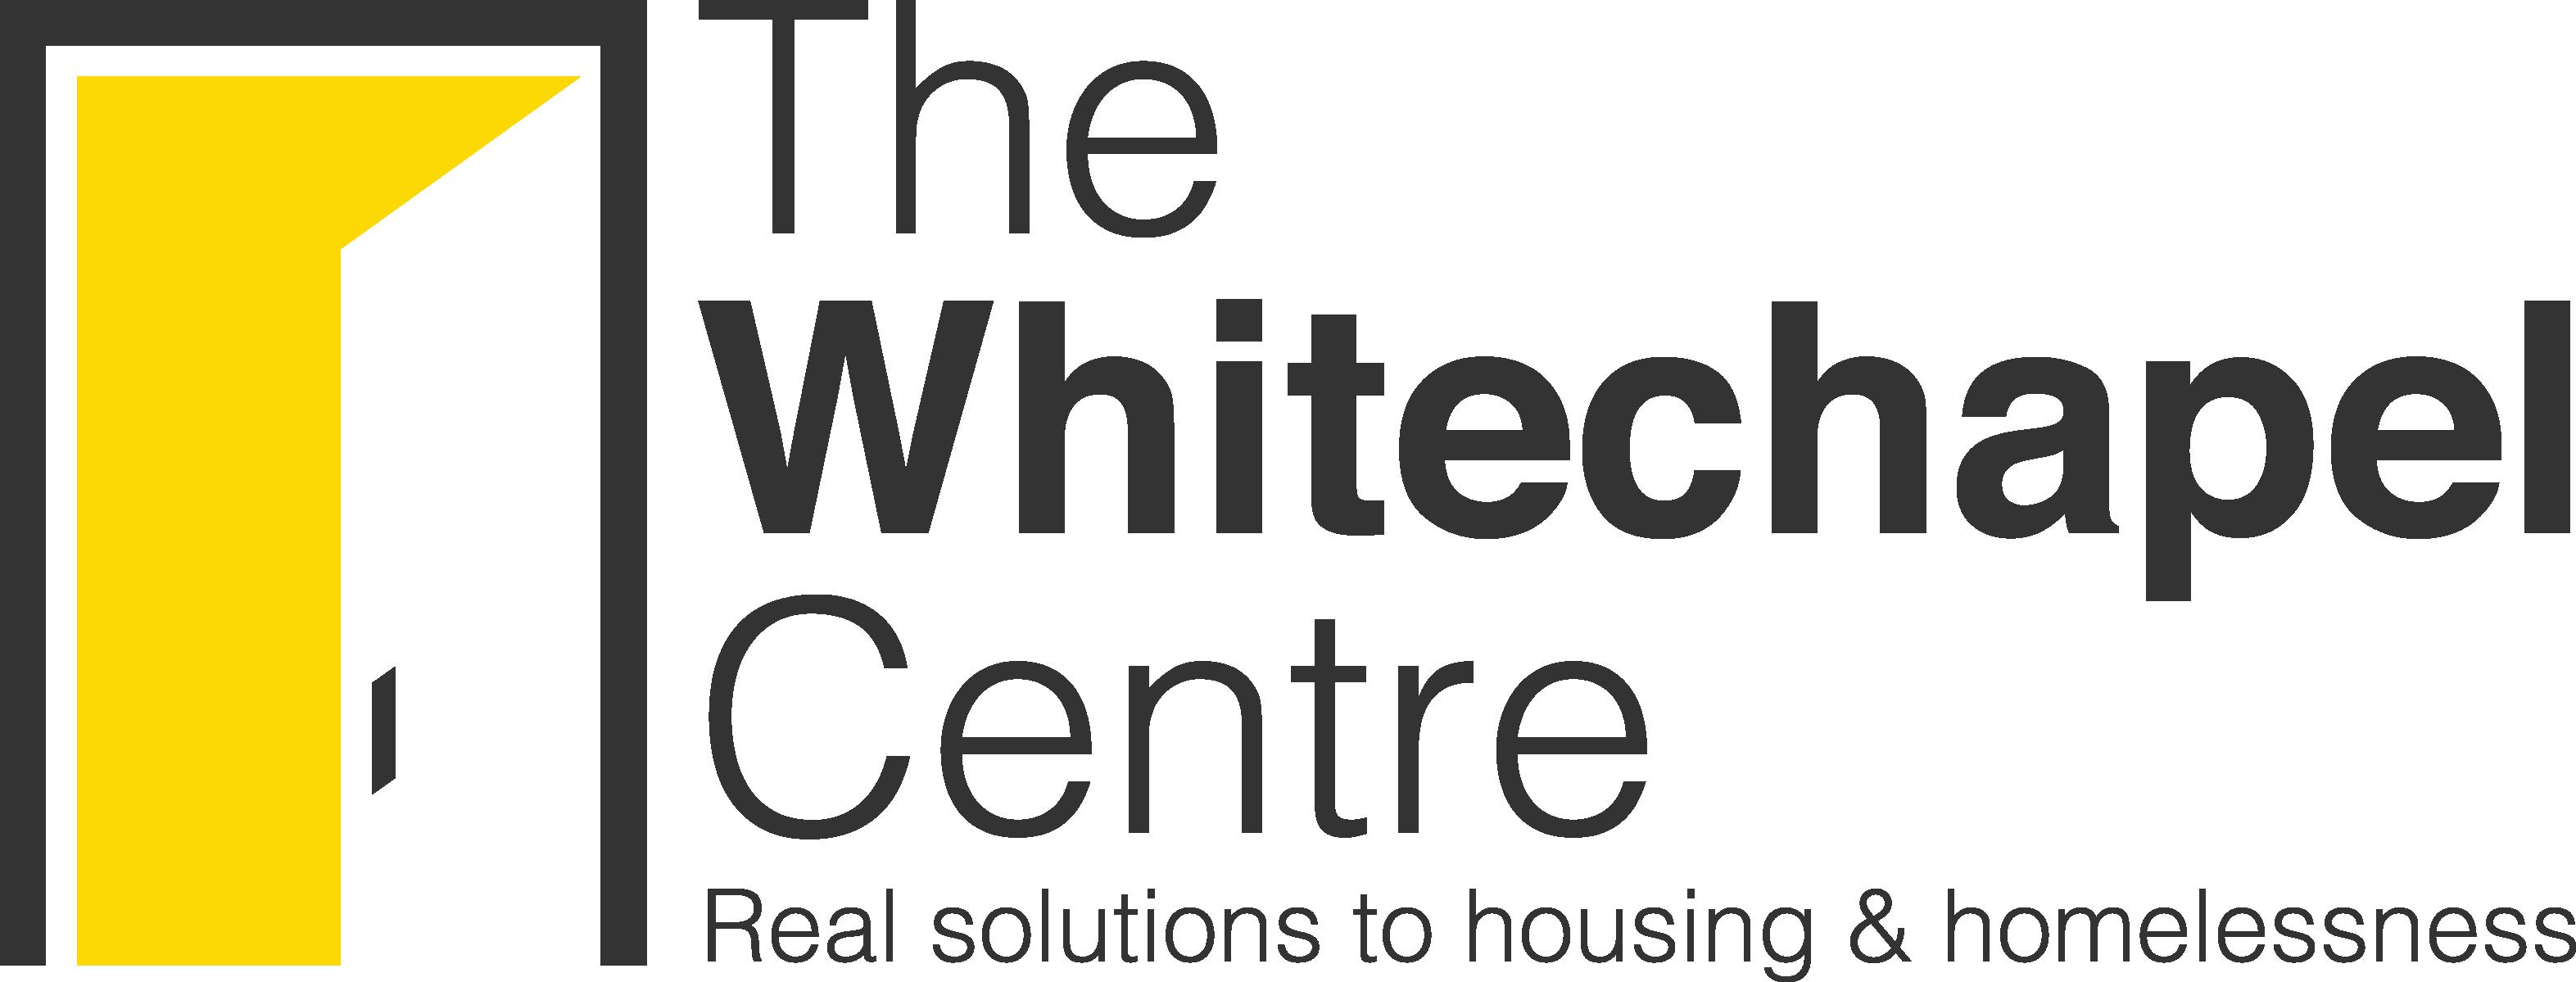 Whitechapel-Centre-Logo